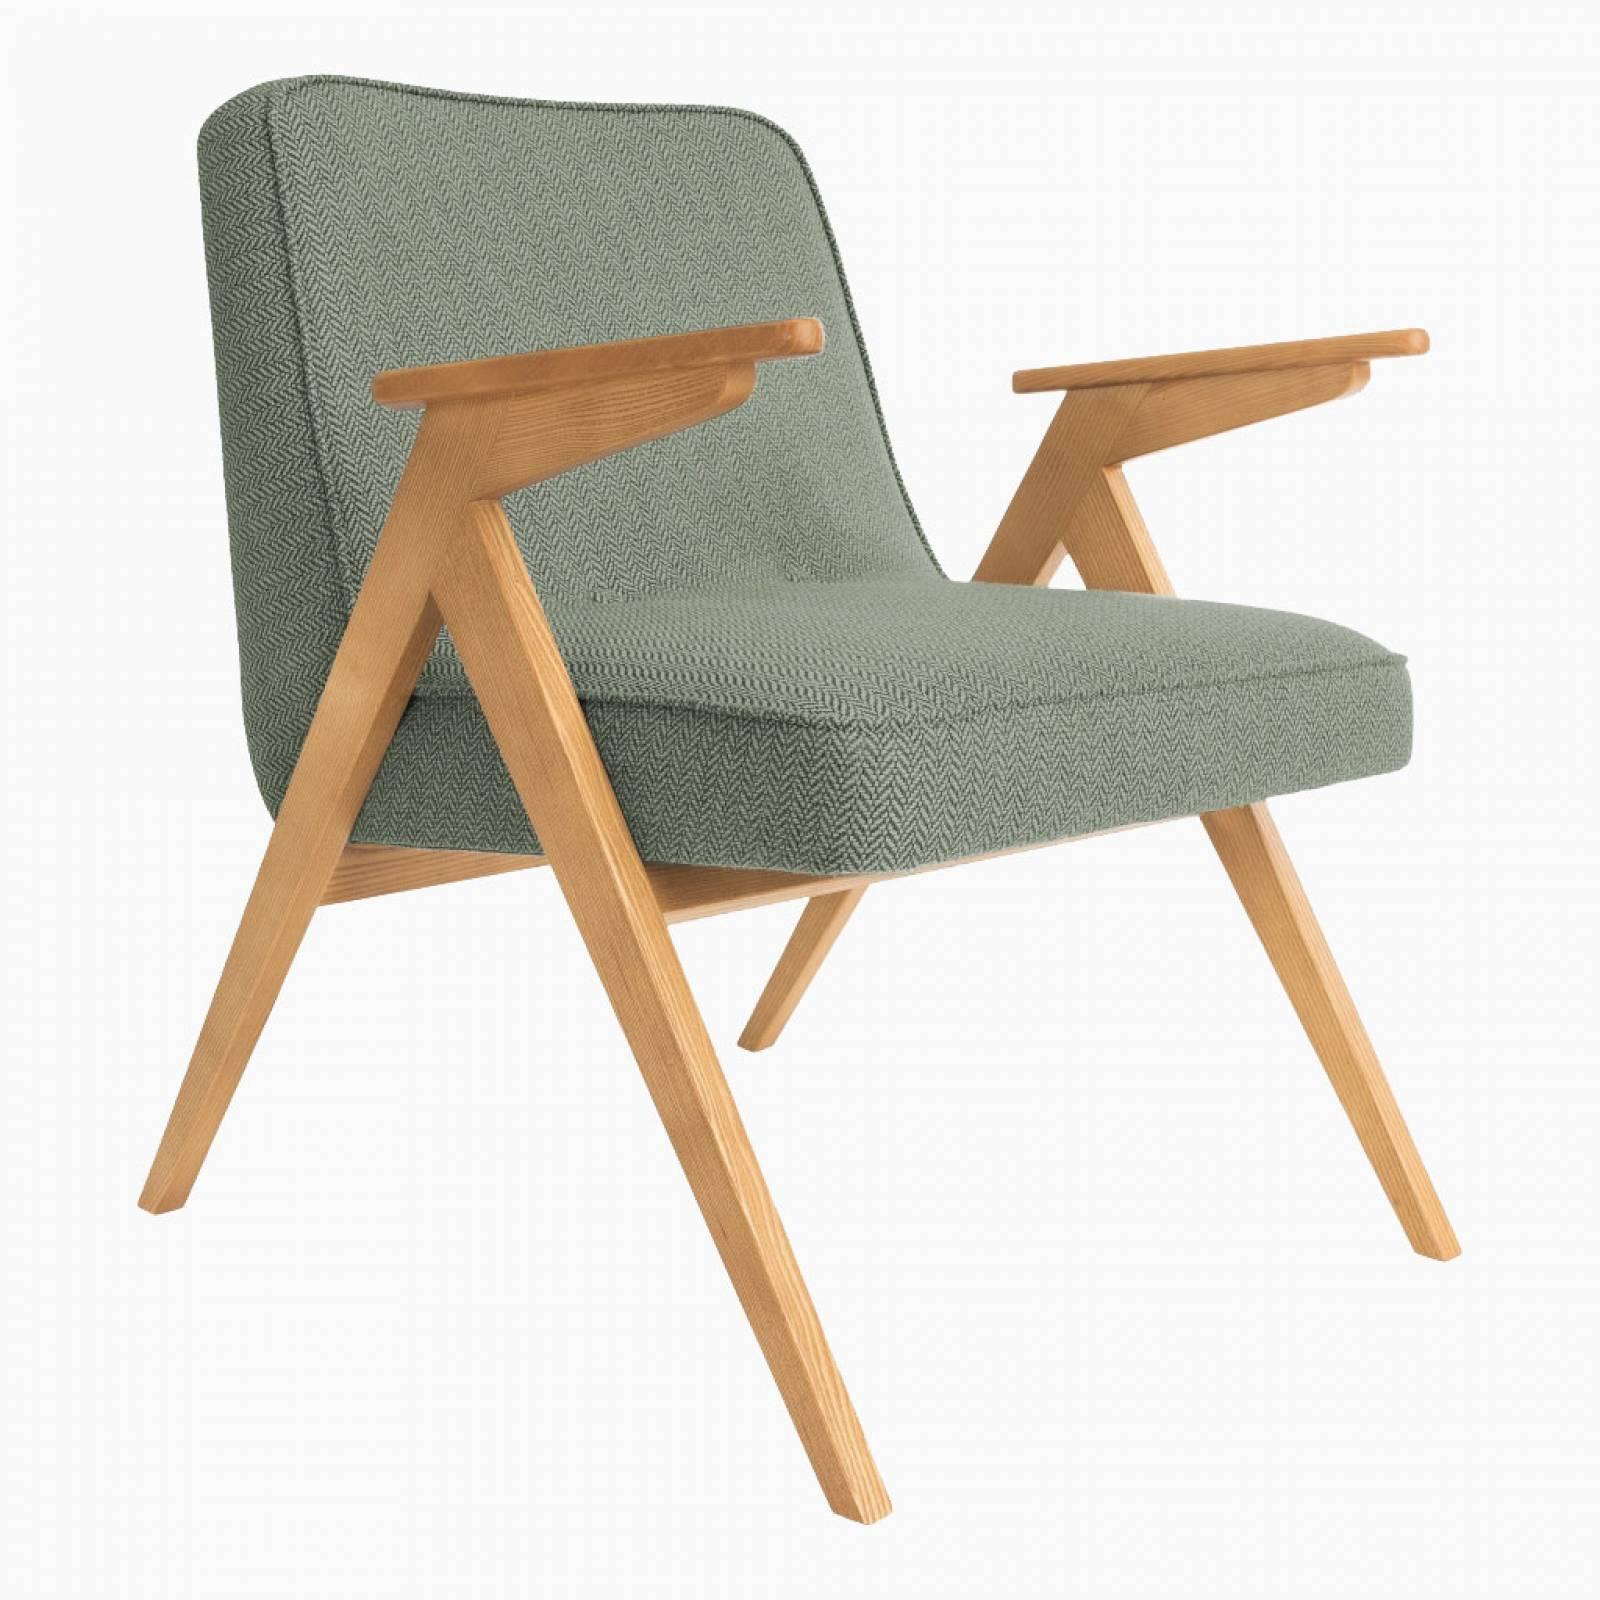 Bunny Armchair - Type 1 Fabric